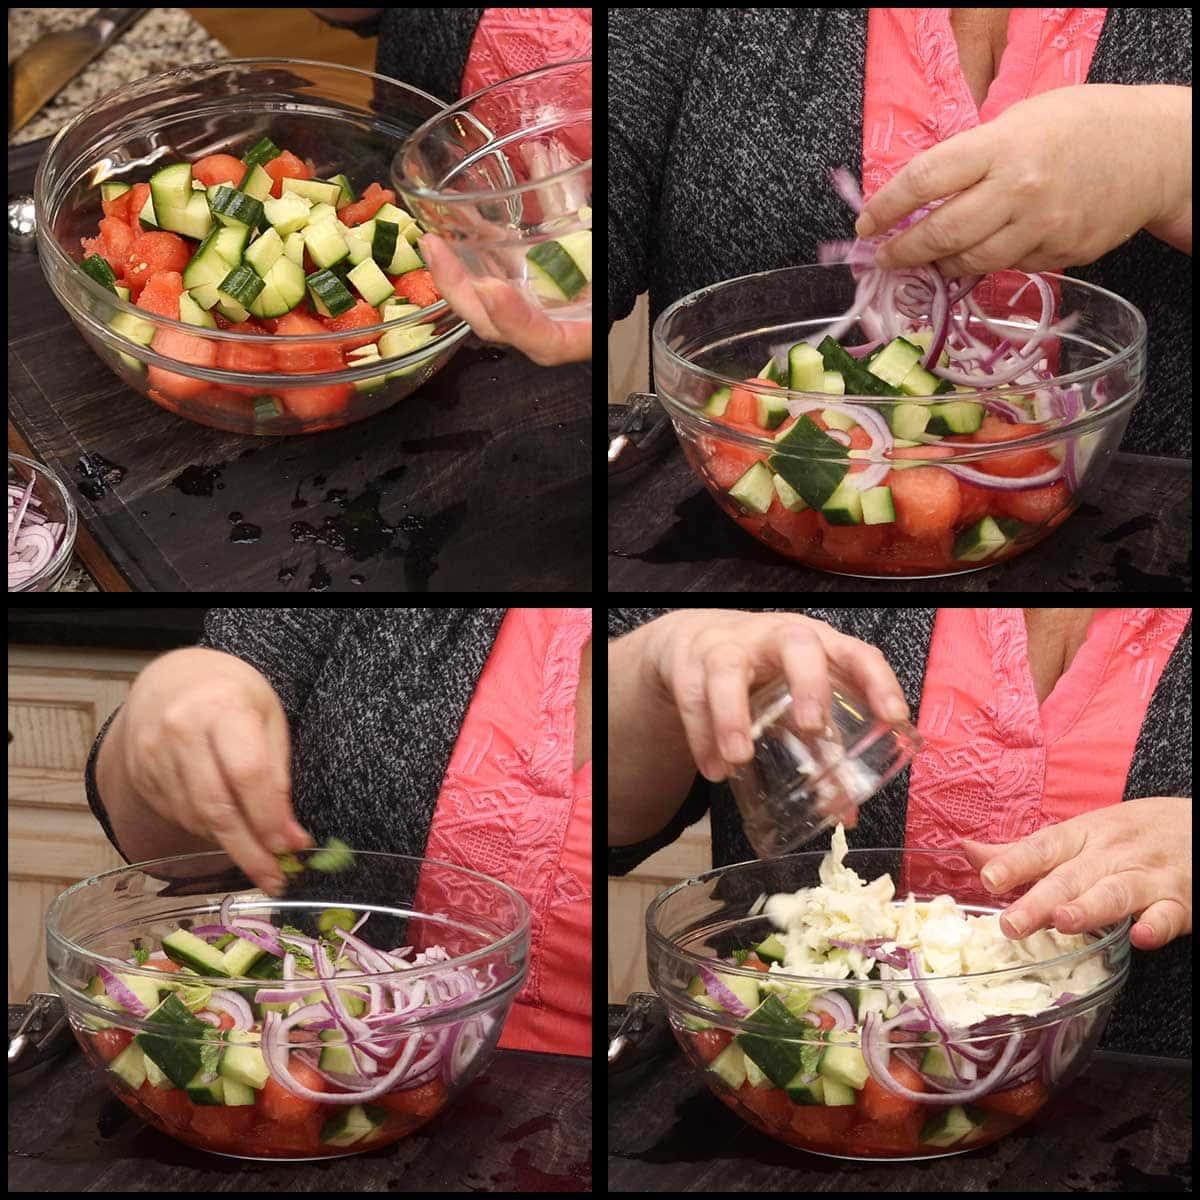 assembling the watermelon feta salad